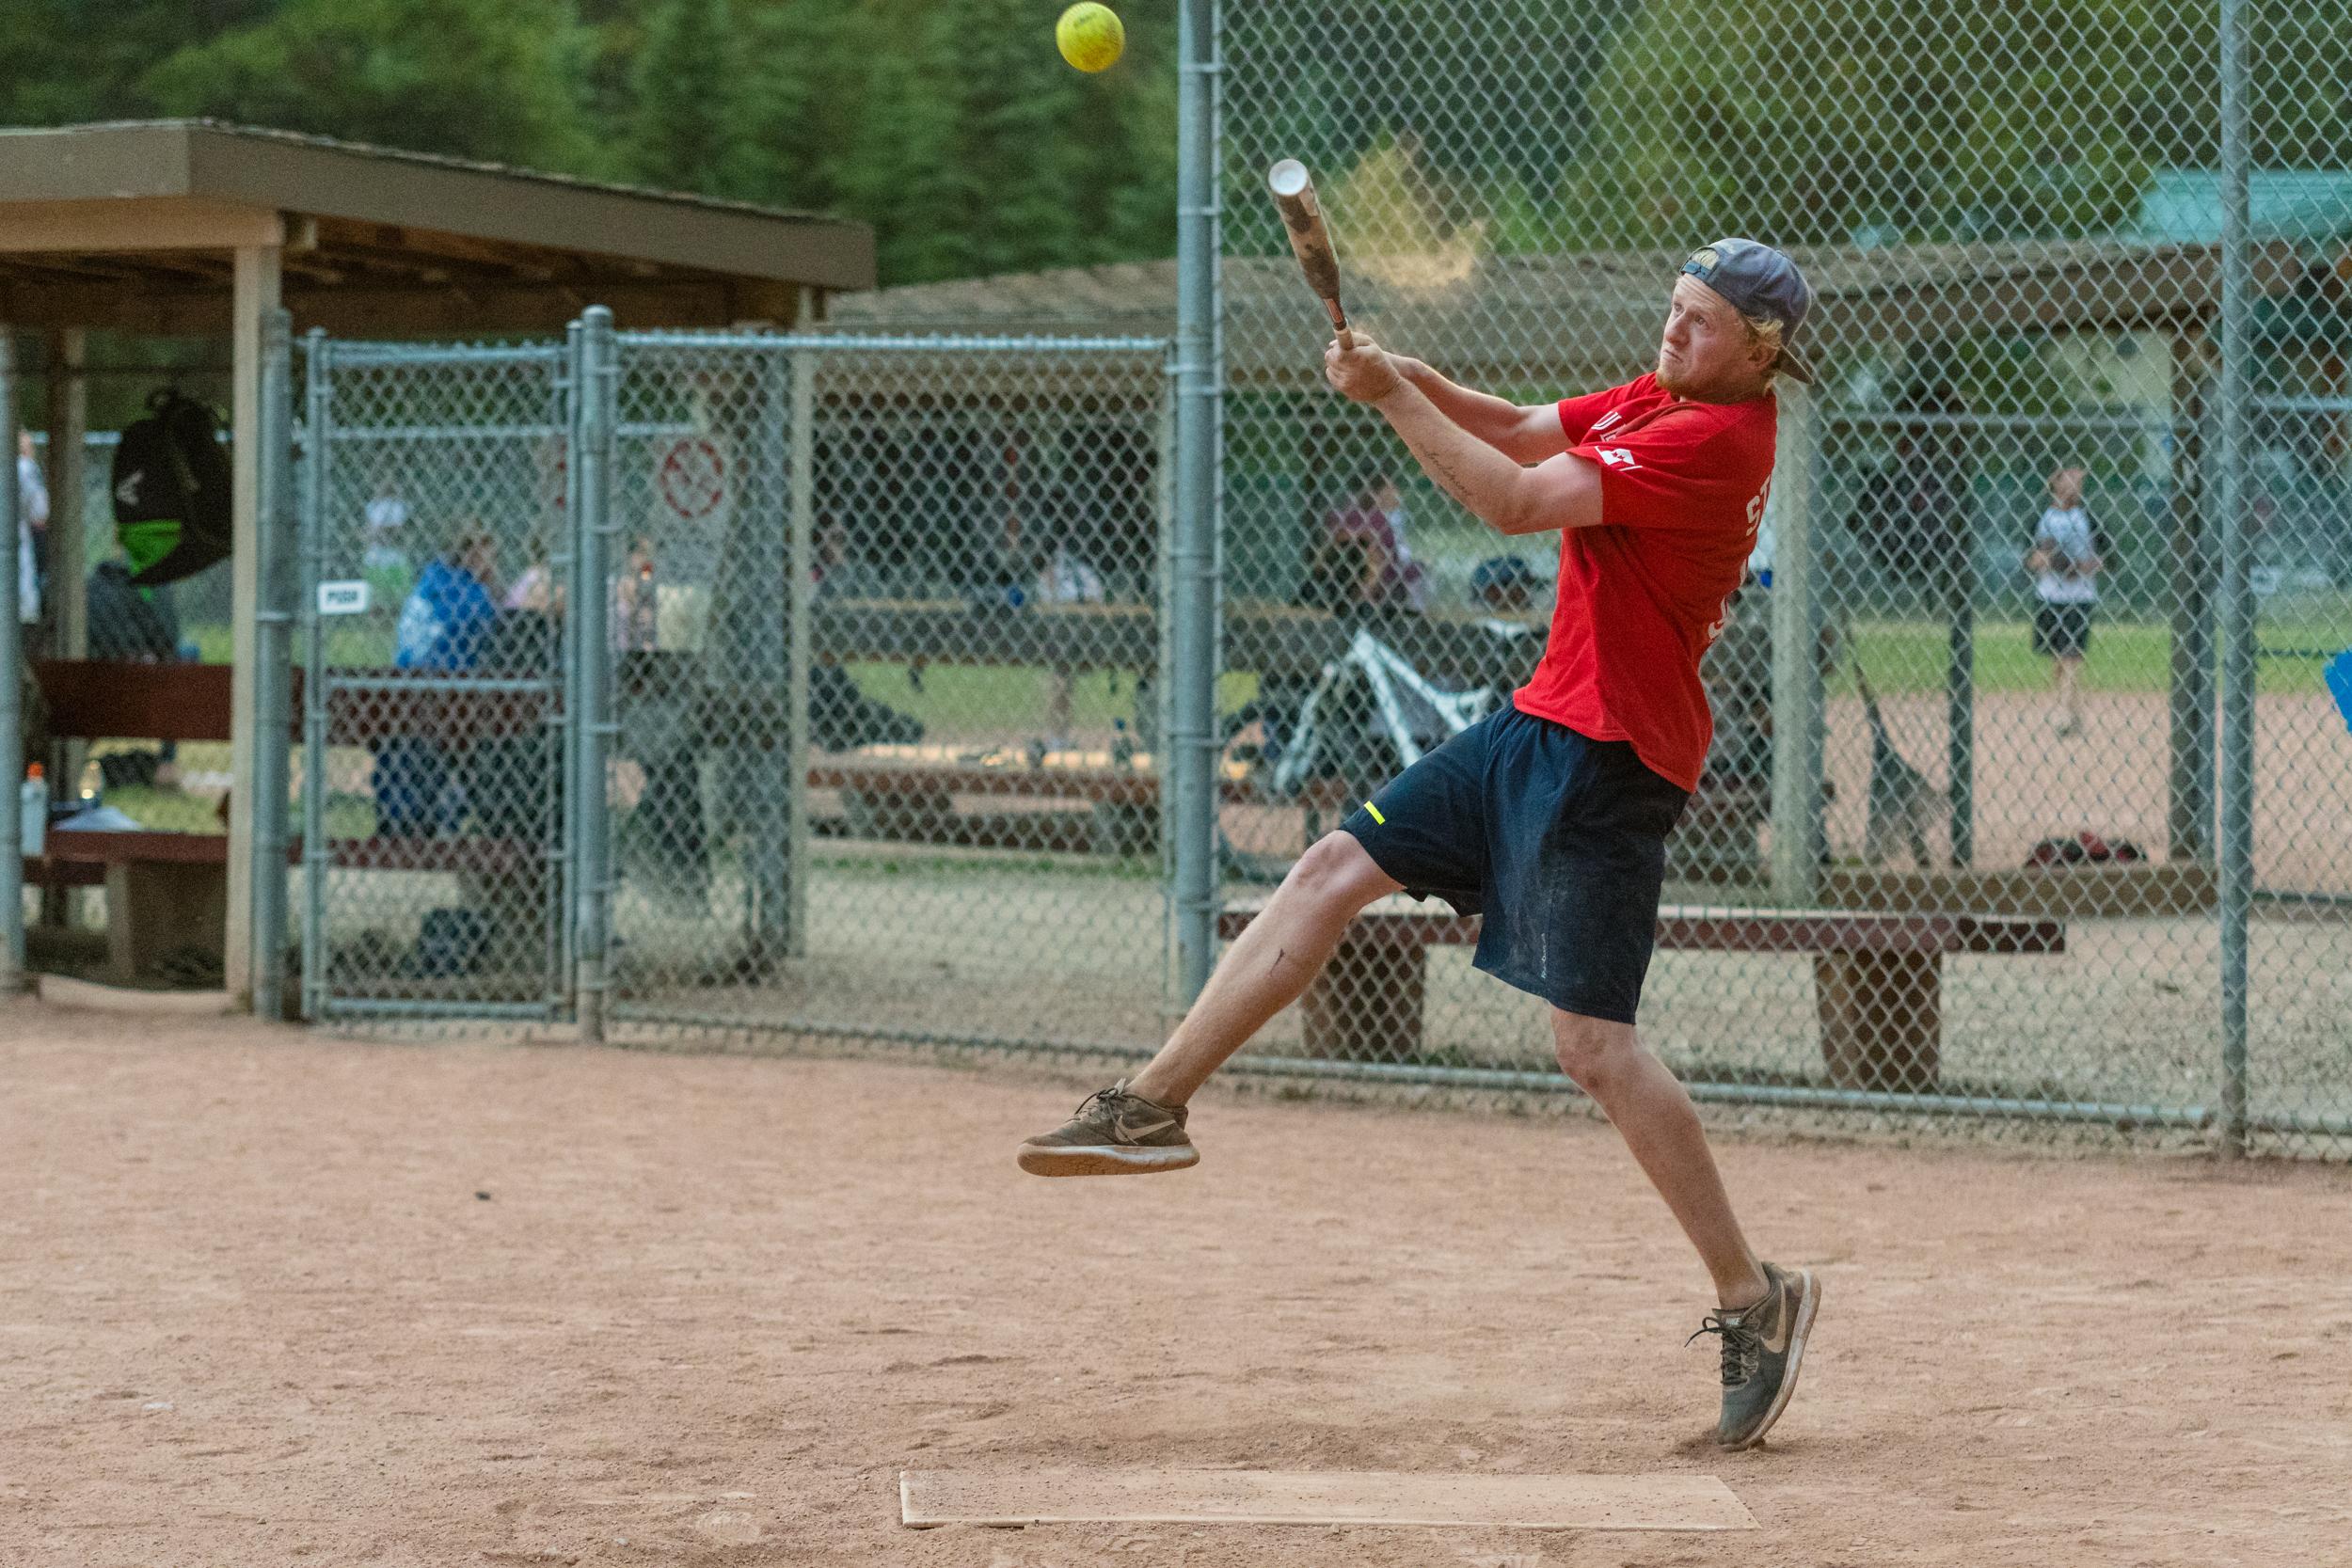 2017 08 01 Softball Quit vs Emerald-212.jpg